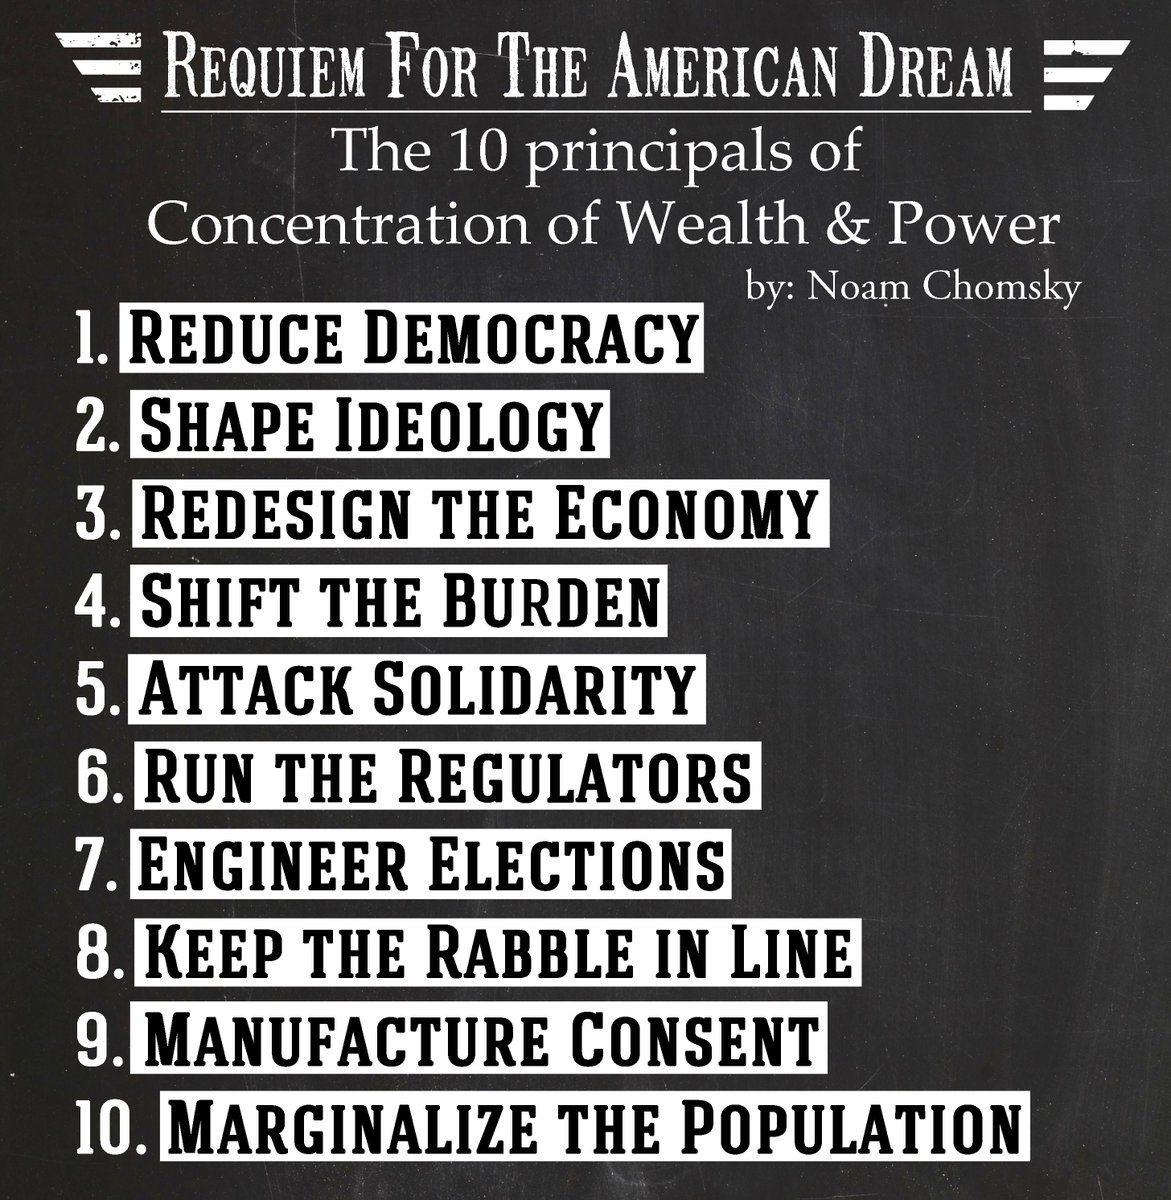 The American Dream Quotes Noam Chomsky's Requiem For The American Dreamthe 10 Principals